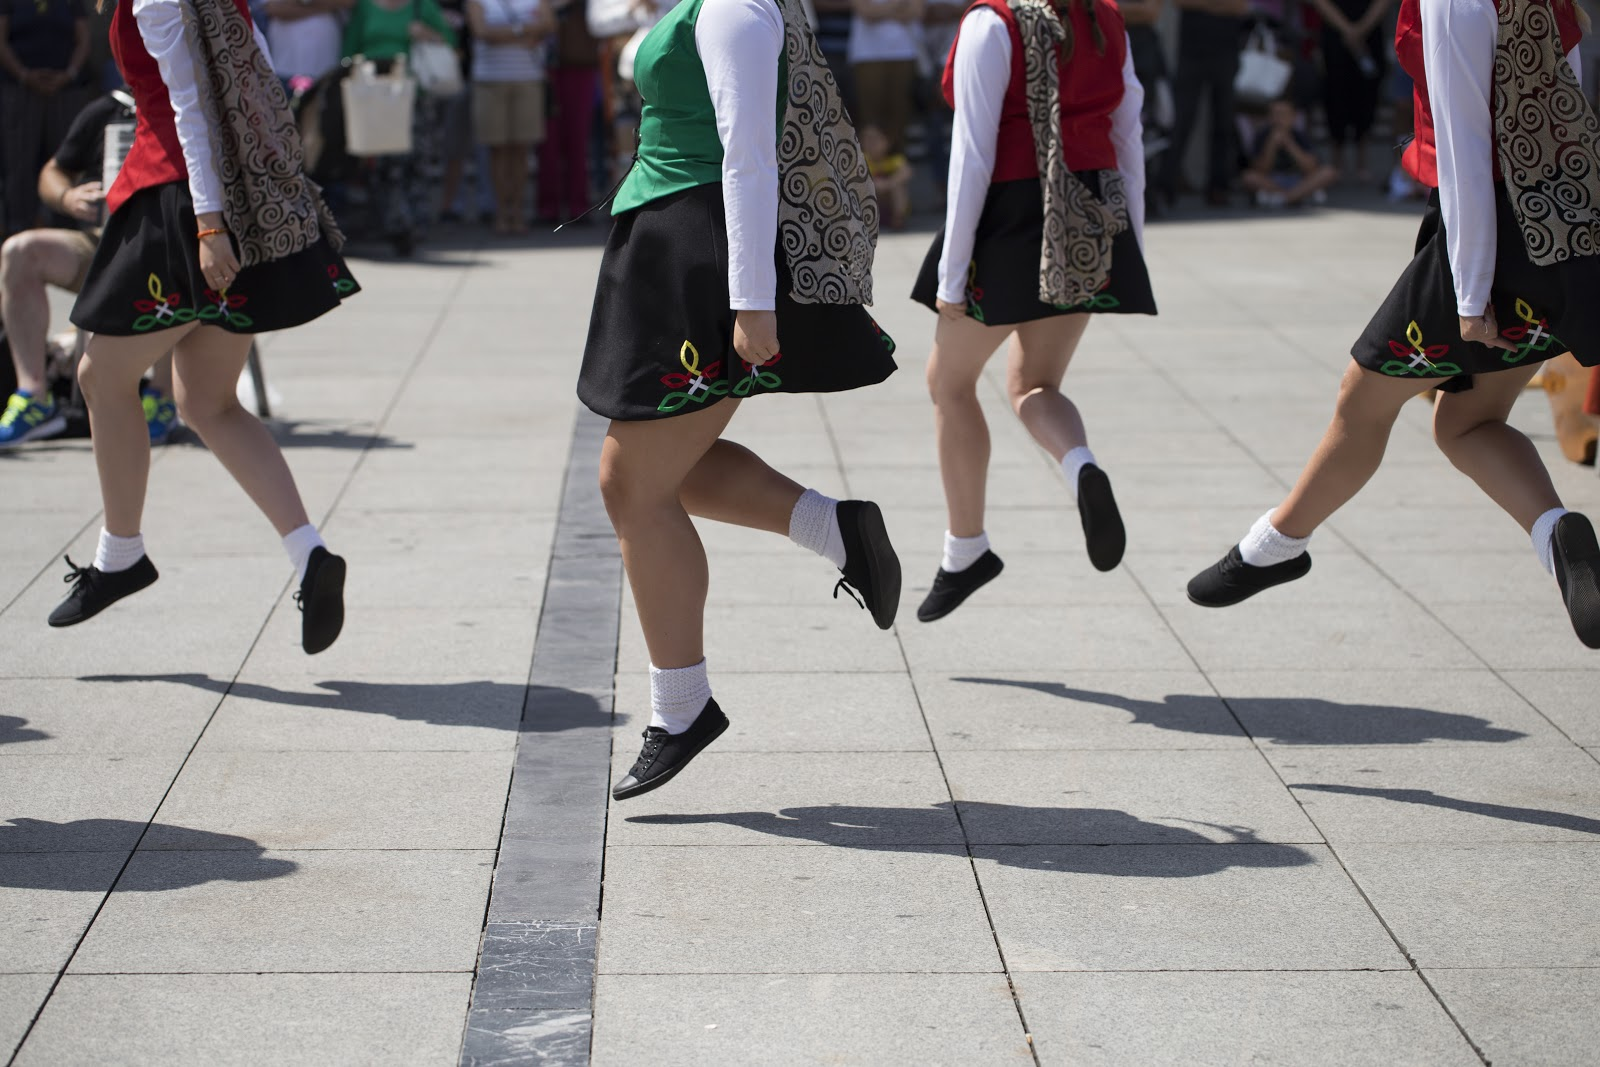 irish dancers dancing in a city square